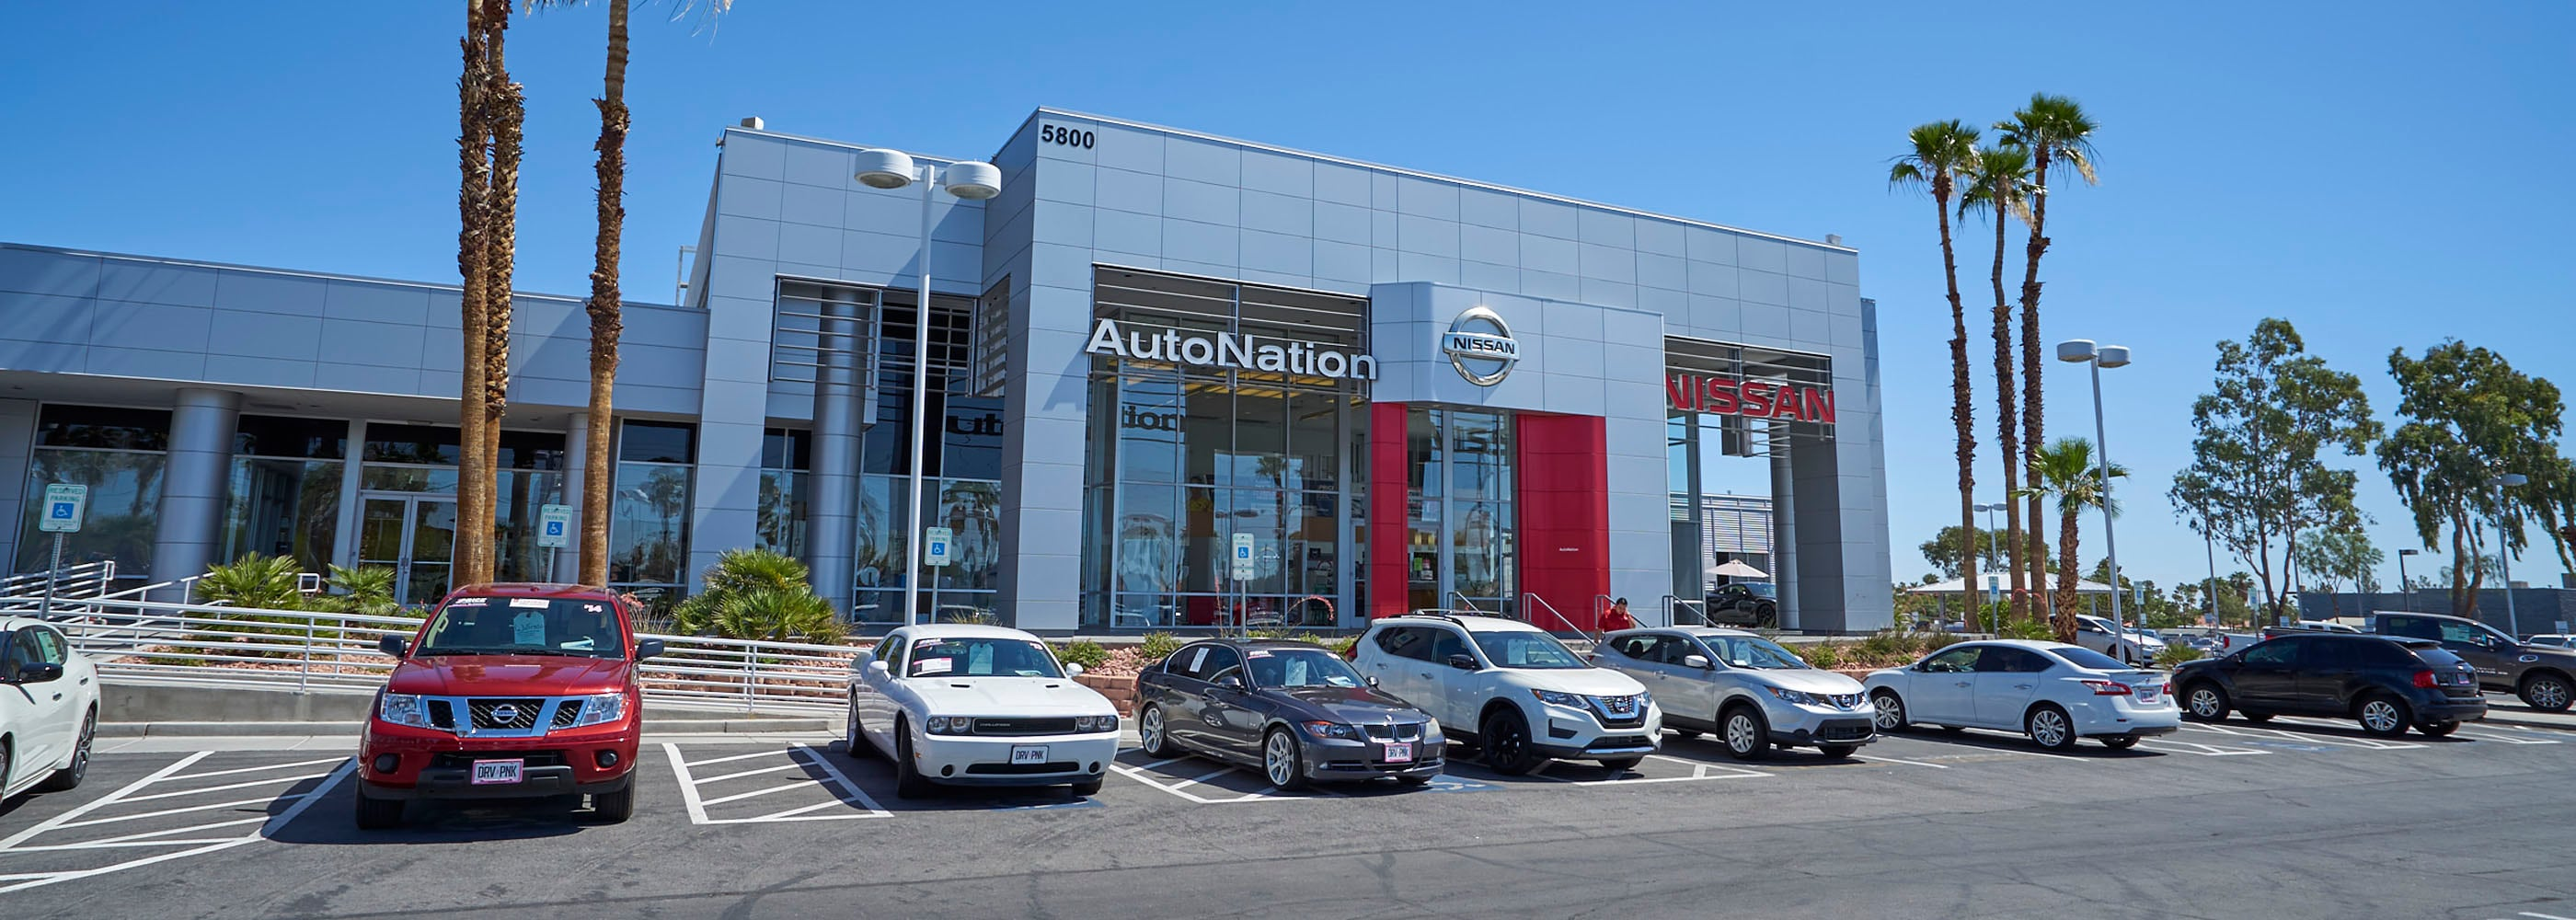 Autonation Nissan Dealer U003eu003e Autonation Nissan Las Vegas Las Vegas